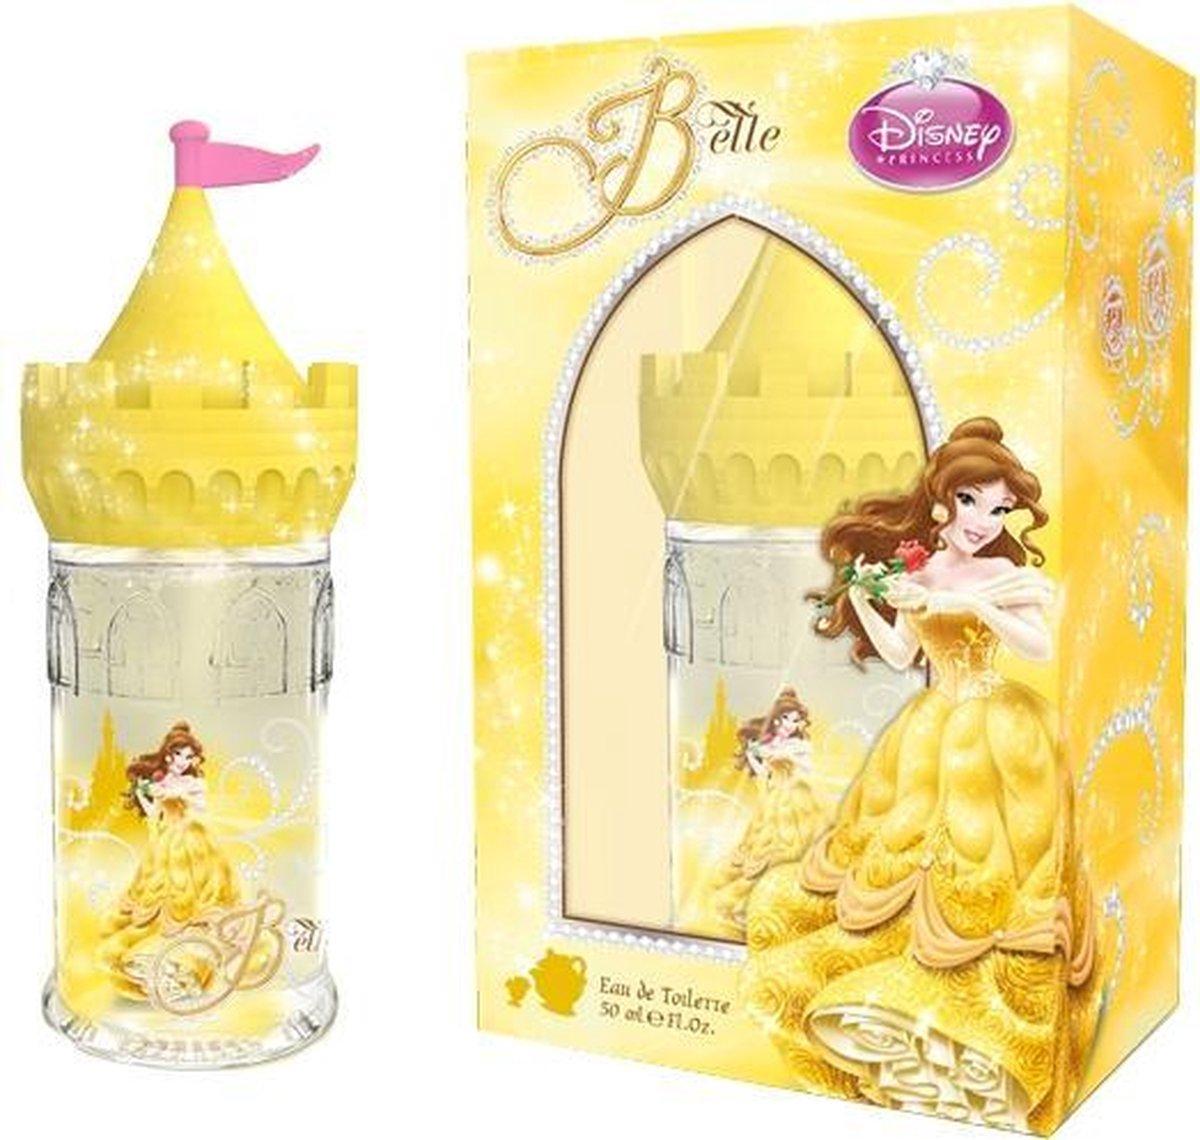 Disney Belle Castle eau de toilette spray 50ml - Disney